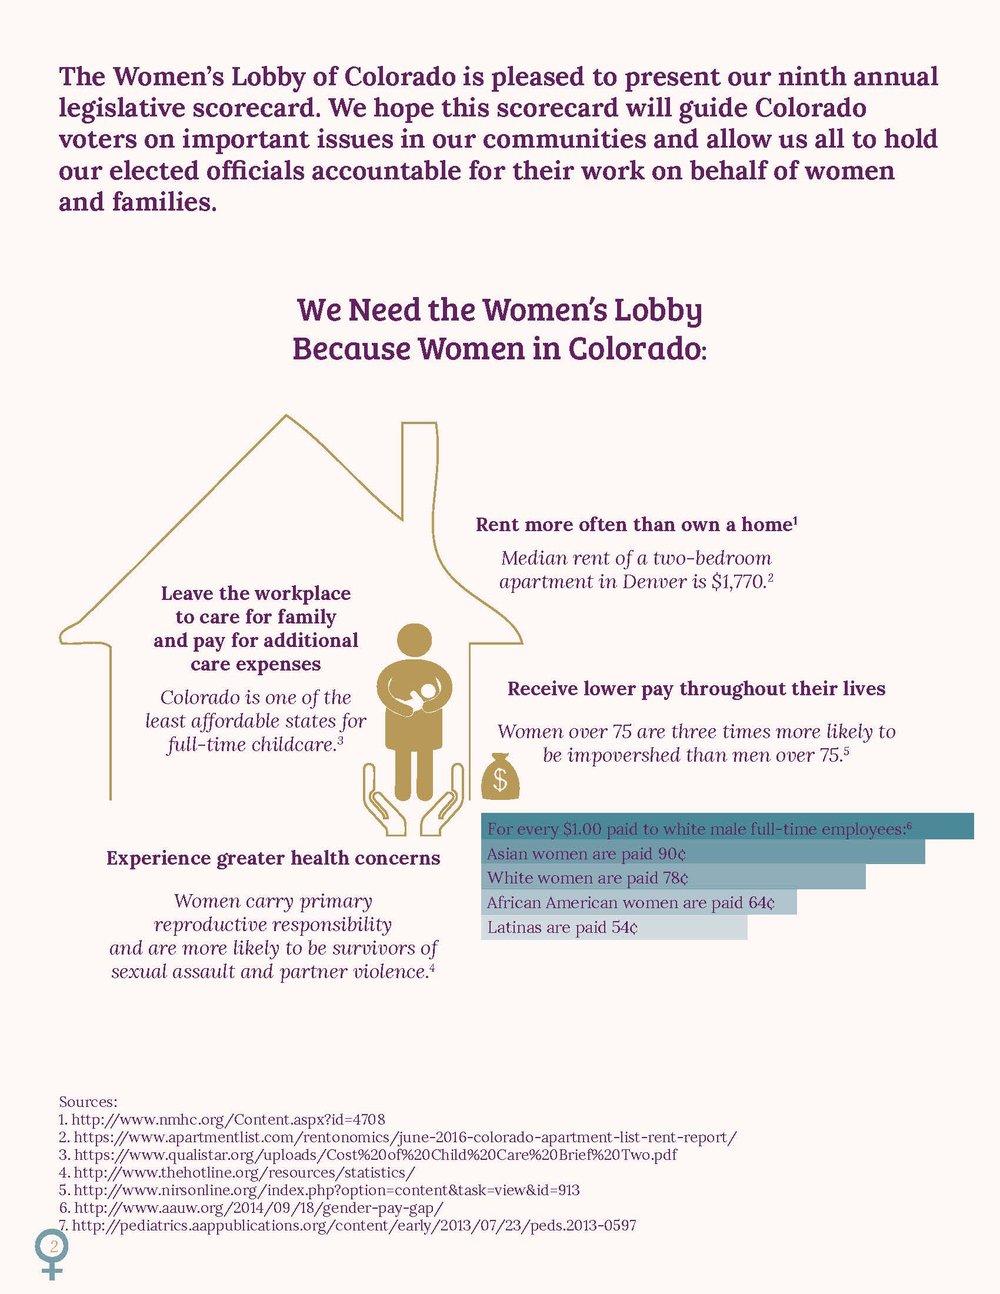 WomensLobbyofColorado2017scorecard_Page_2.jpg